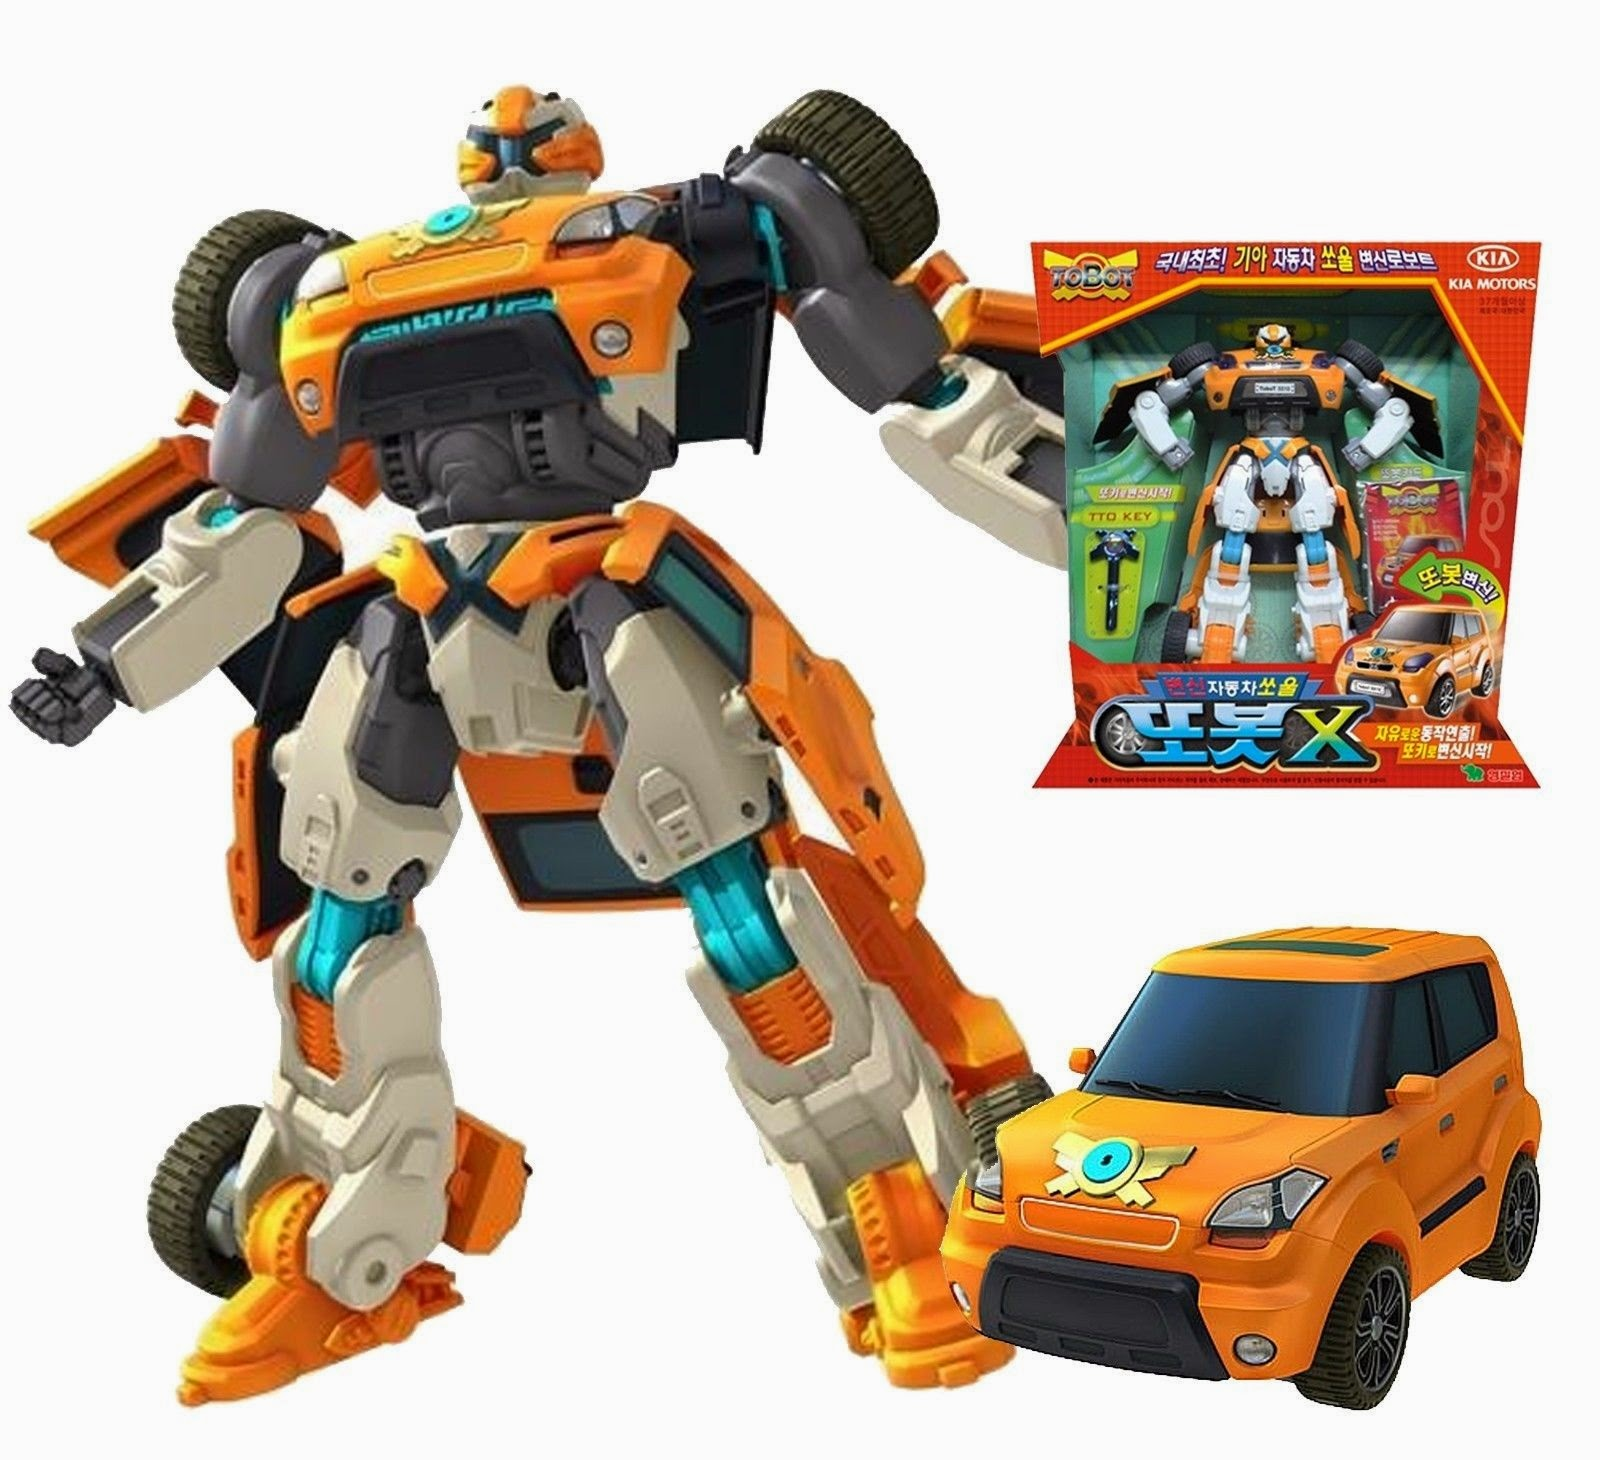 Cassey Boutique: Tobot Transformer Robot Toy